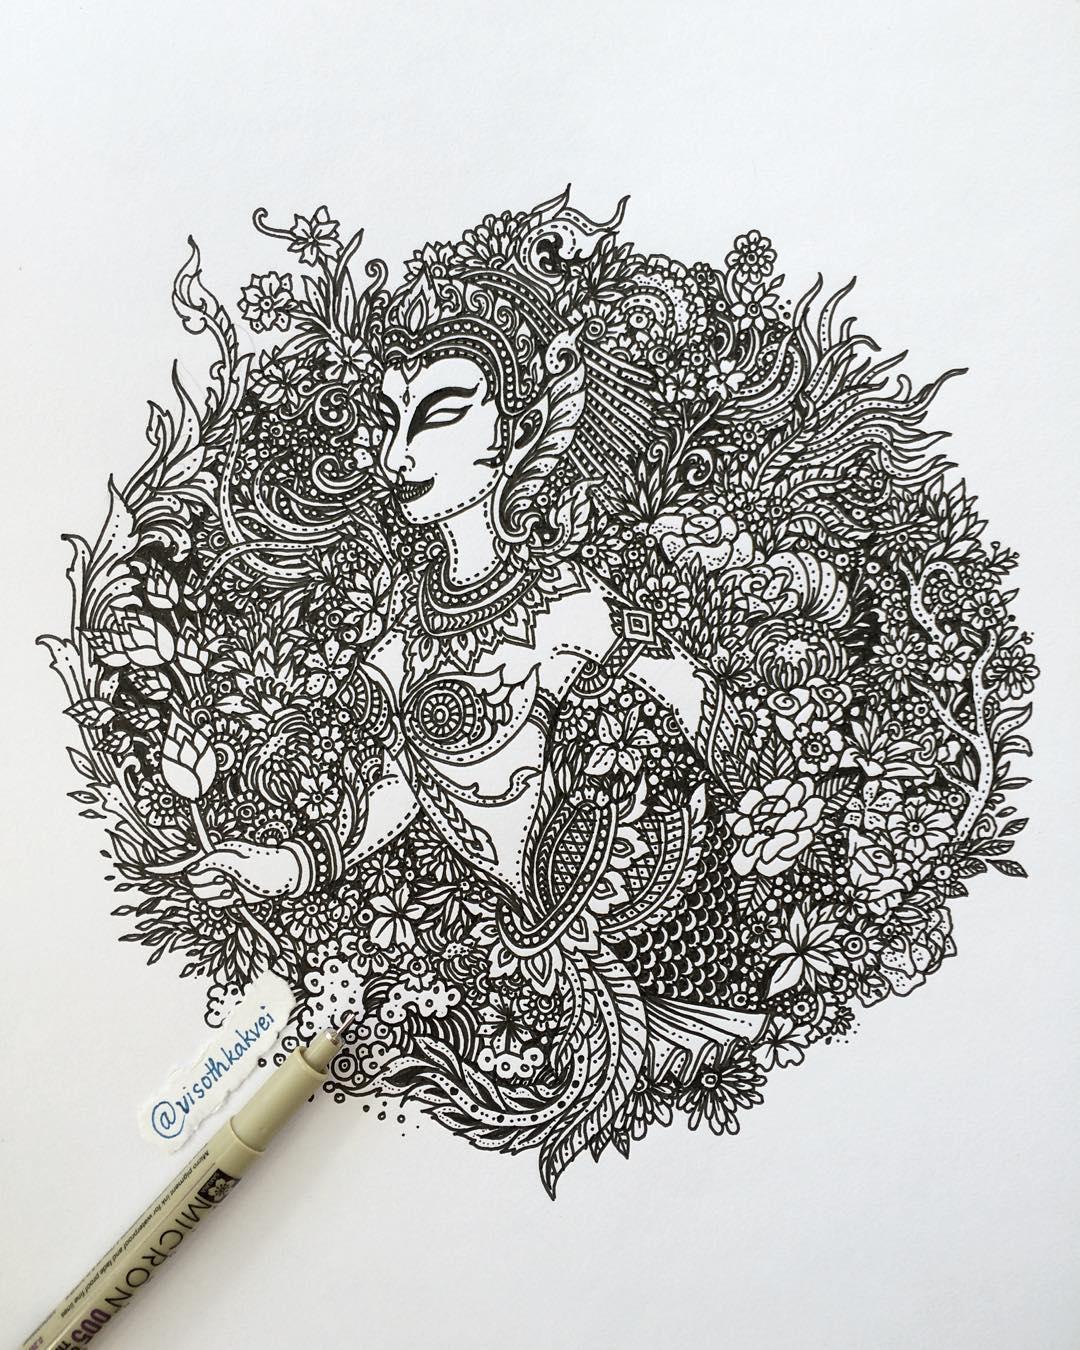 Гипнотические иллюстрации от Висота Каквея (Visoth Kakvei).